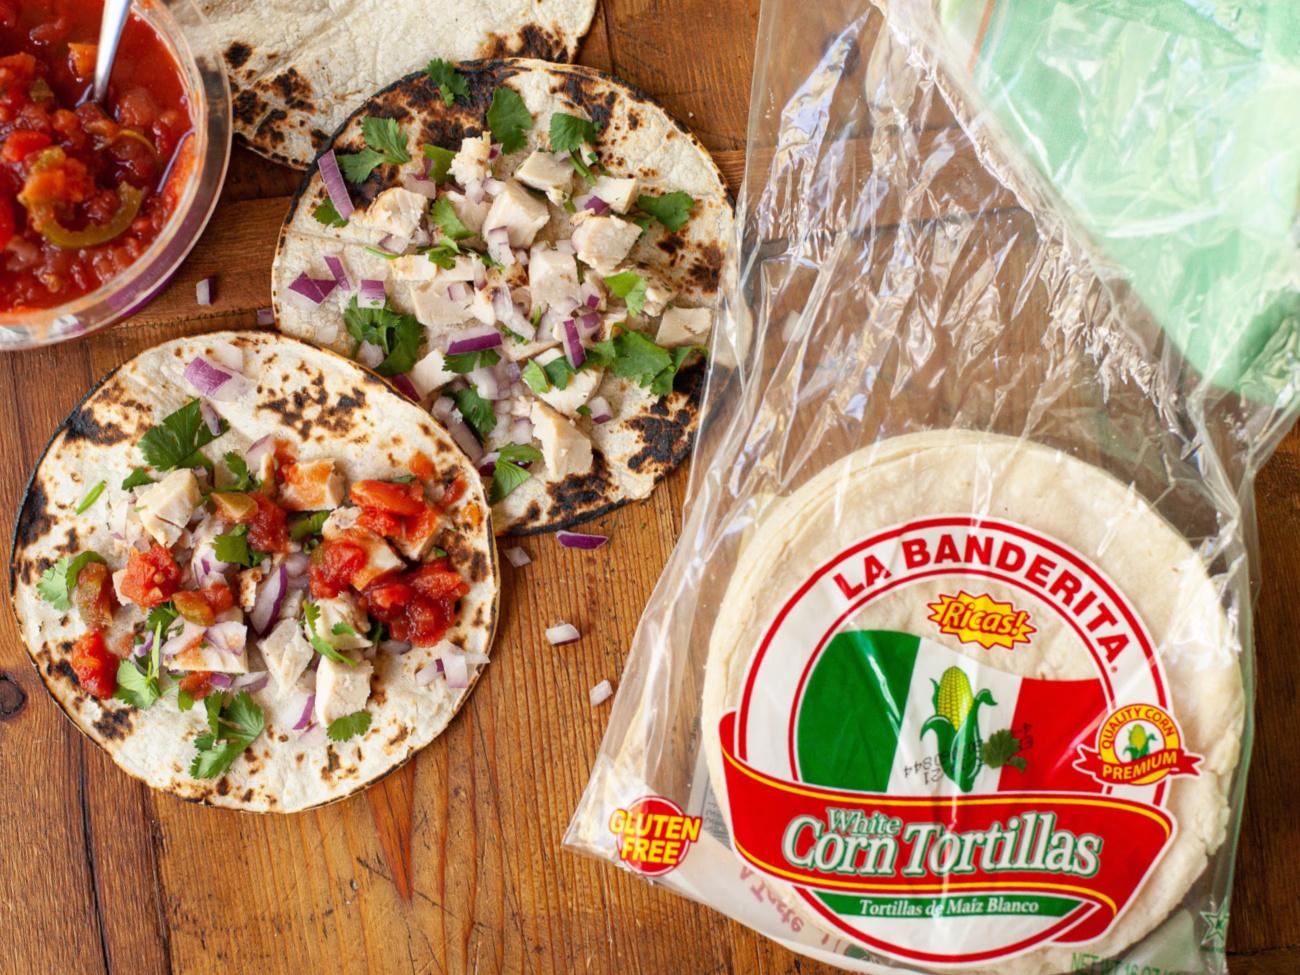 La Banderita Corn Tortillas As Low As 19¢ Per Pack At Publix (Plus Cheap Flour Tortillas) on I Heart Publix